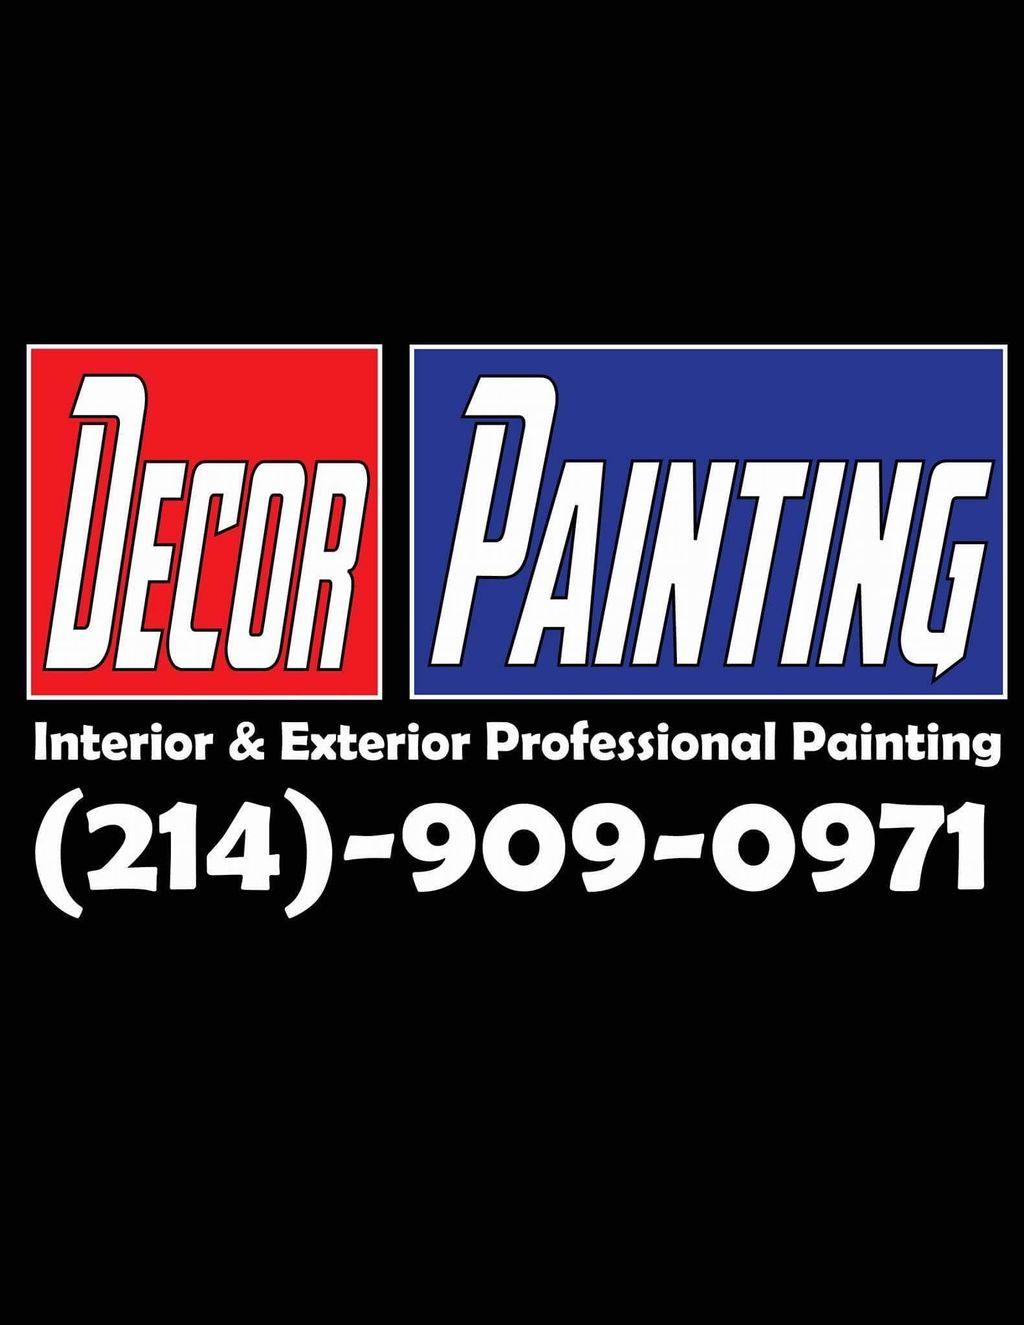 Decor Painting